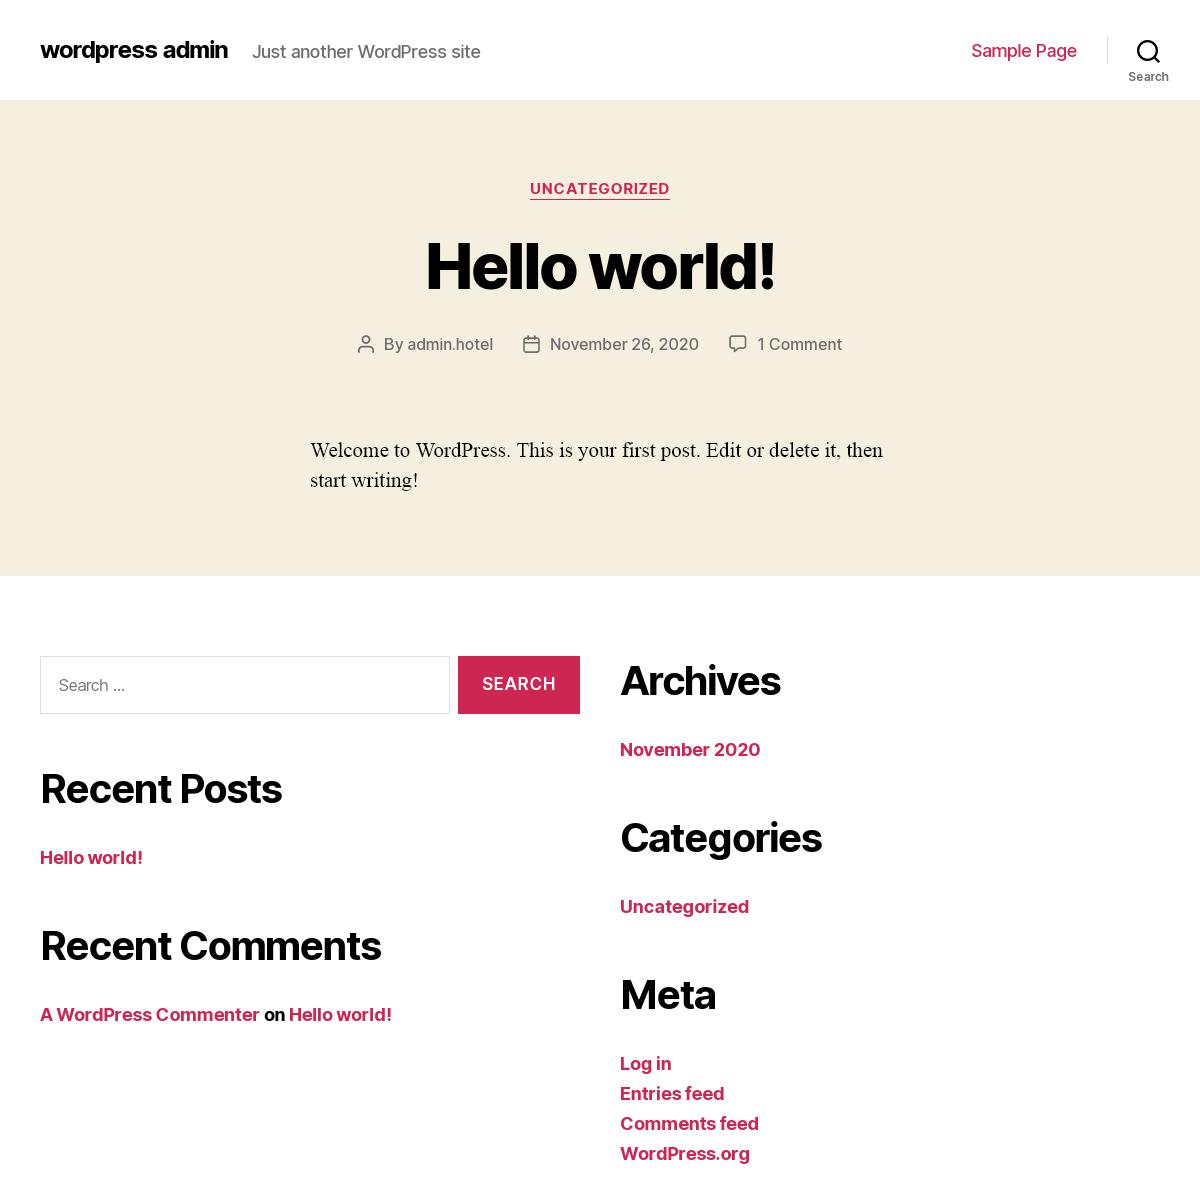 wordpress admin – Just another WordPress site